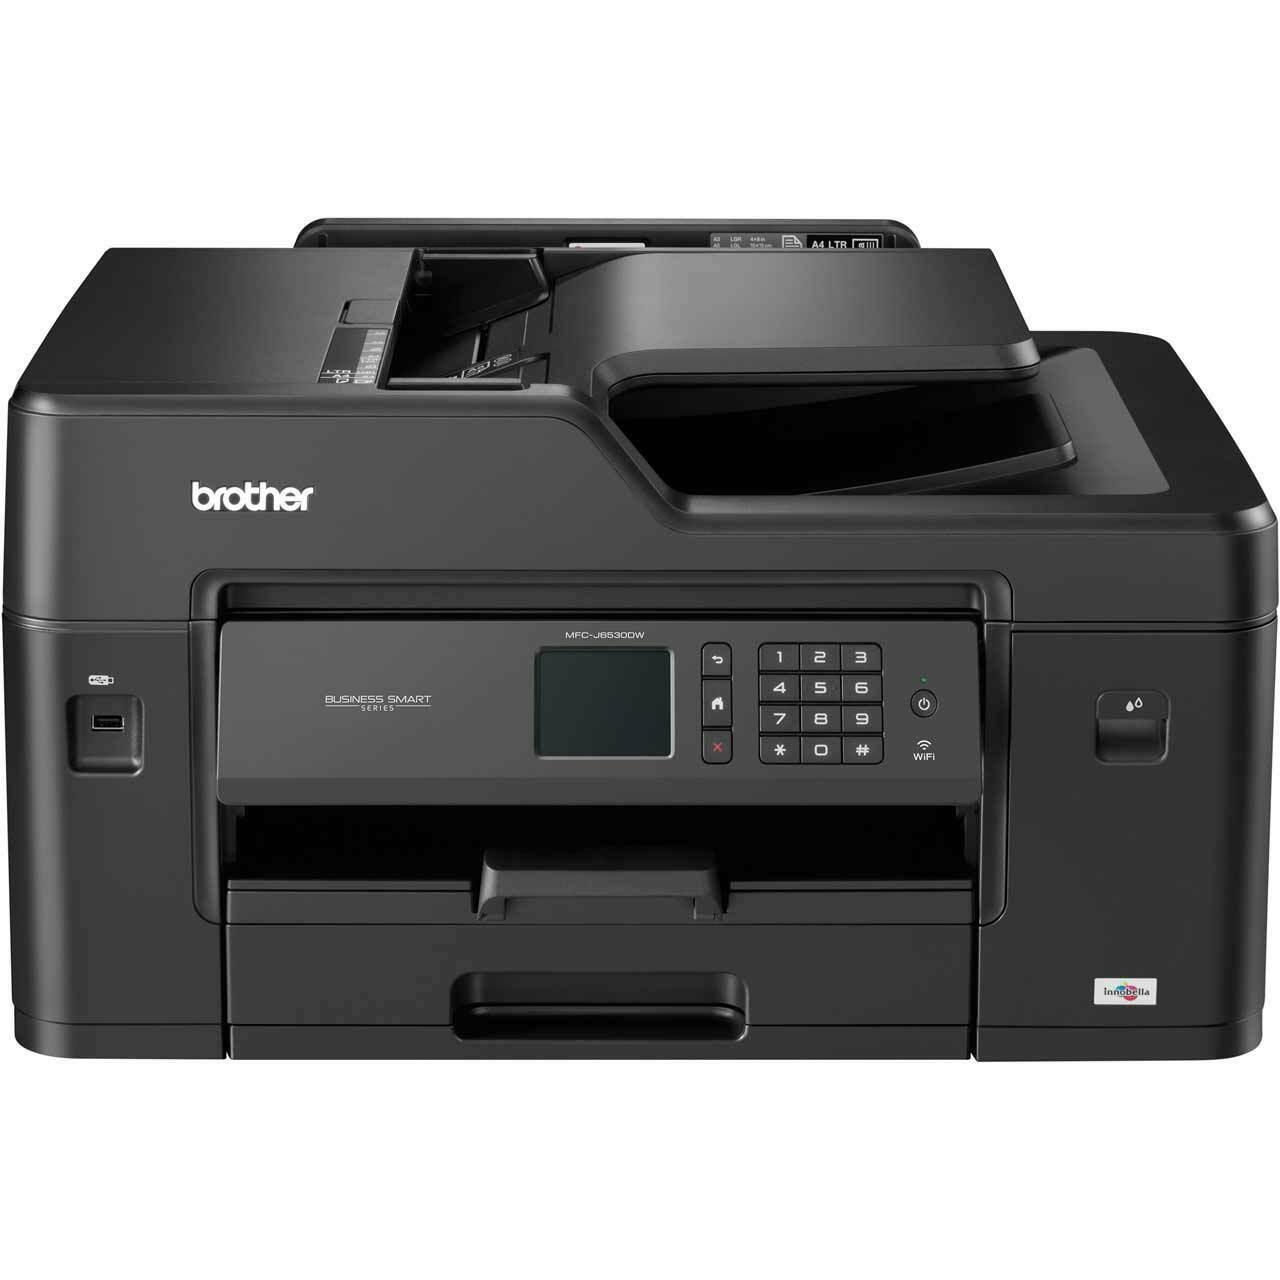 Brother Printer MFC-J6530DW All-In-One Inkjet Printer £119.20 + £60 cashback at  AO on eBay